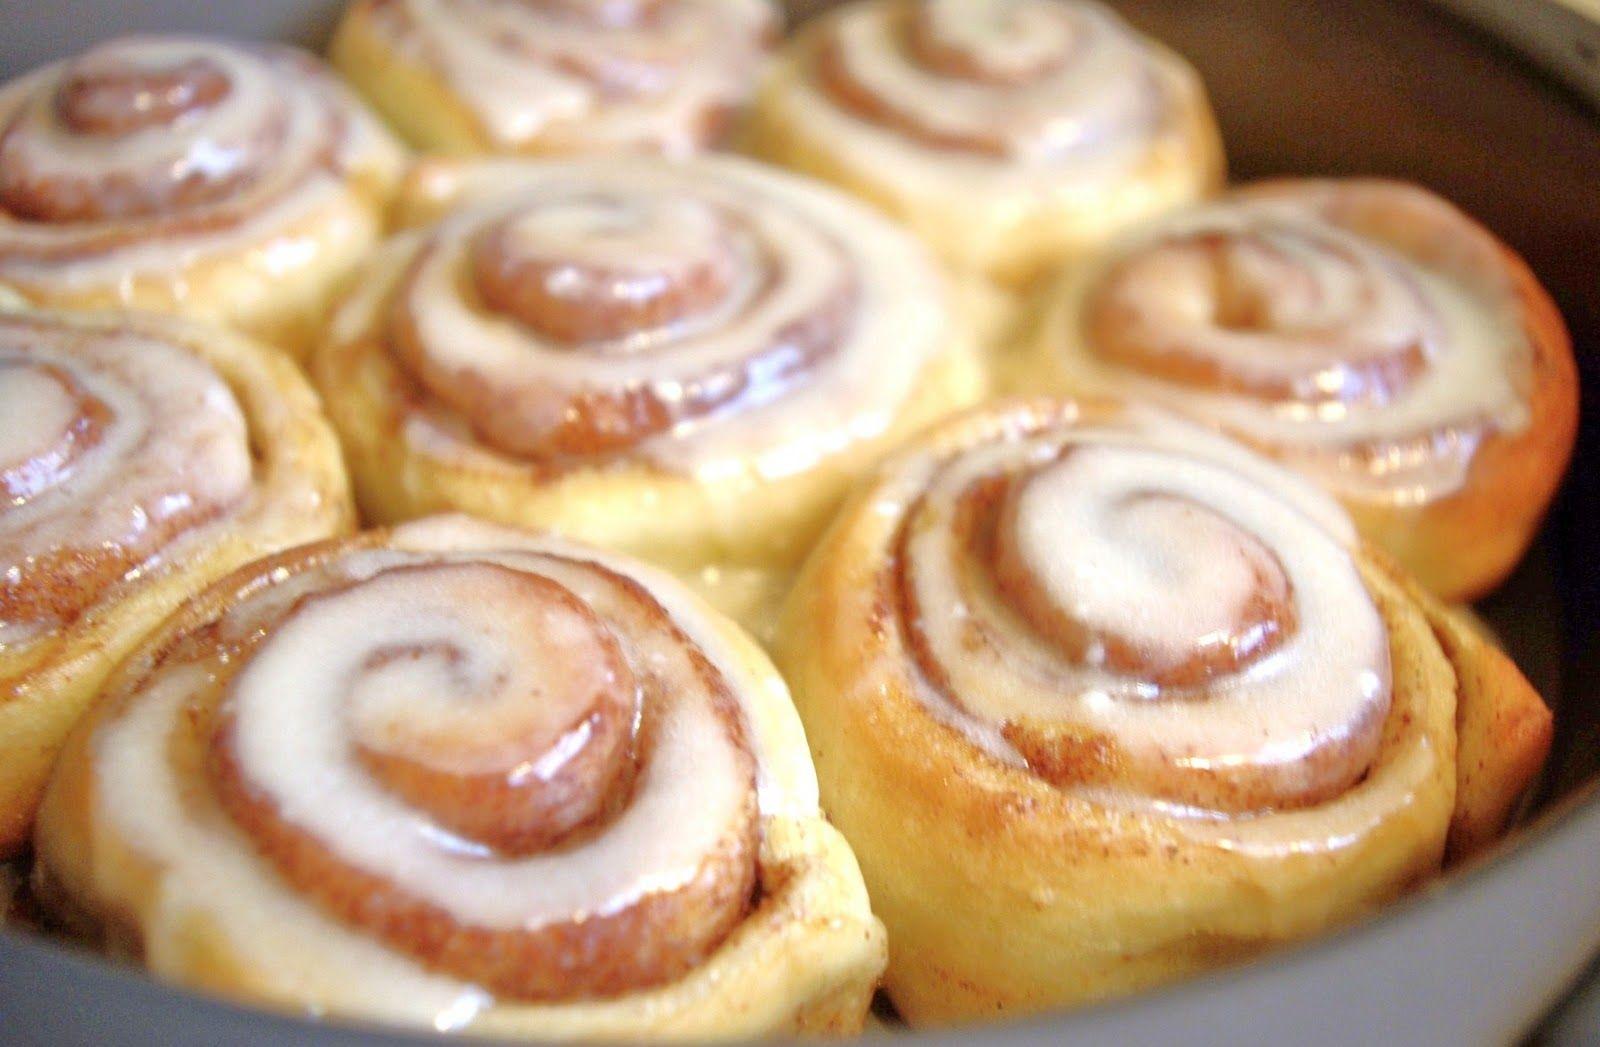 Resepi Roti Cinnamon Rolls Resepi Bonda Cinnamon Roll Pancakes Recipe Cinnamon Rolls Cinnamon Roll Cake